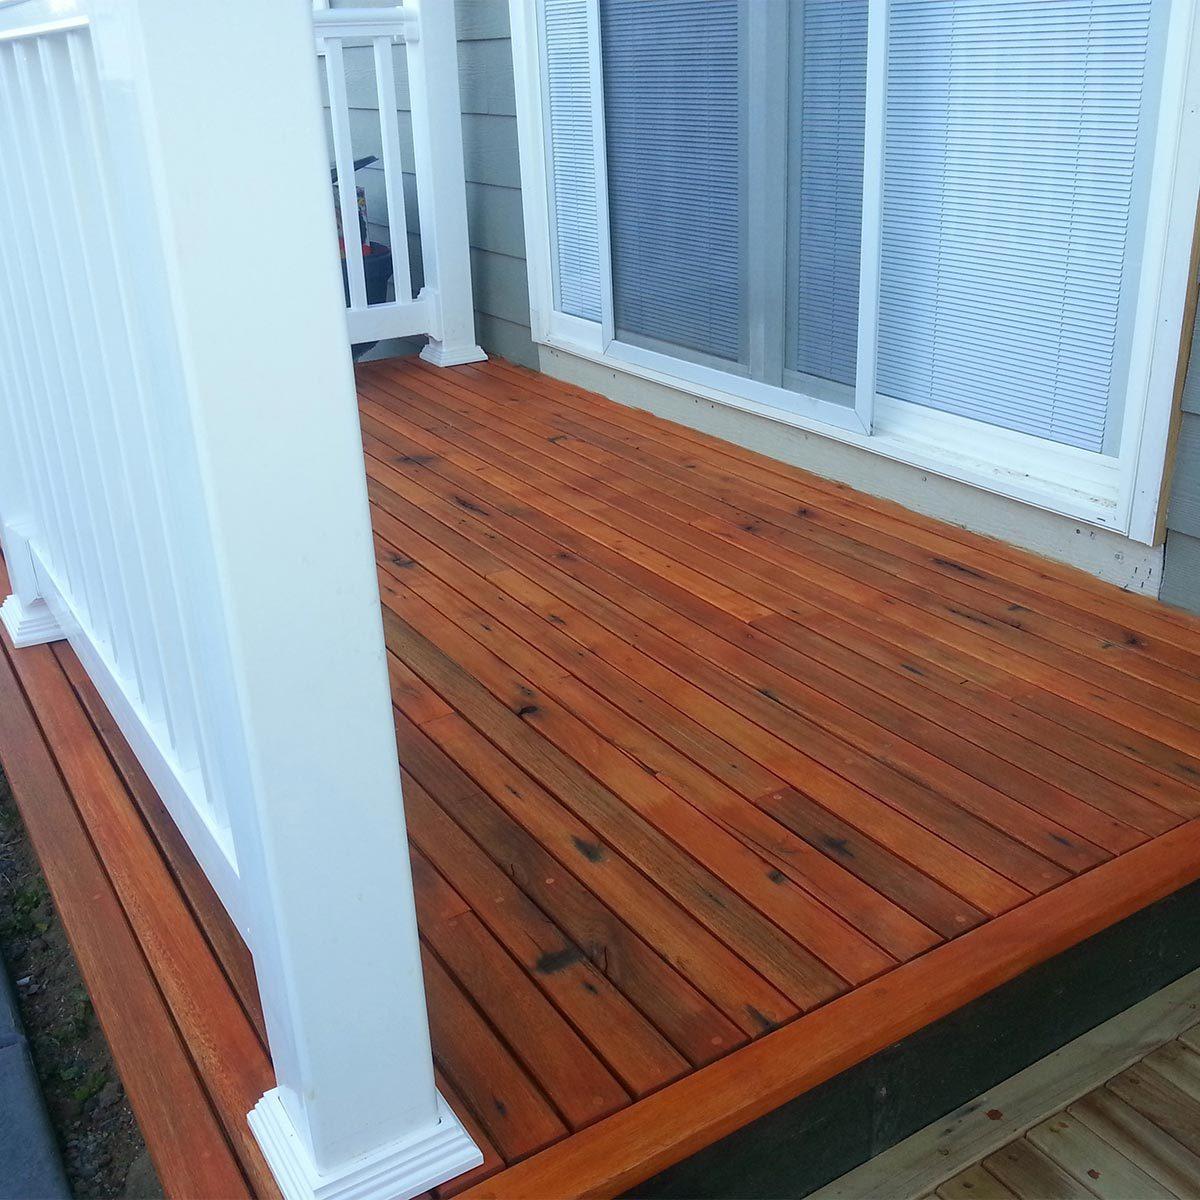 Reclaimed Lumber Decking